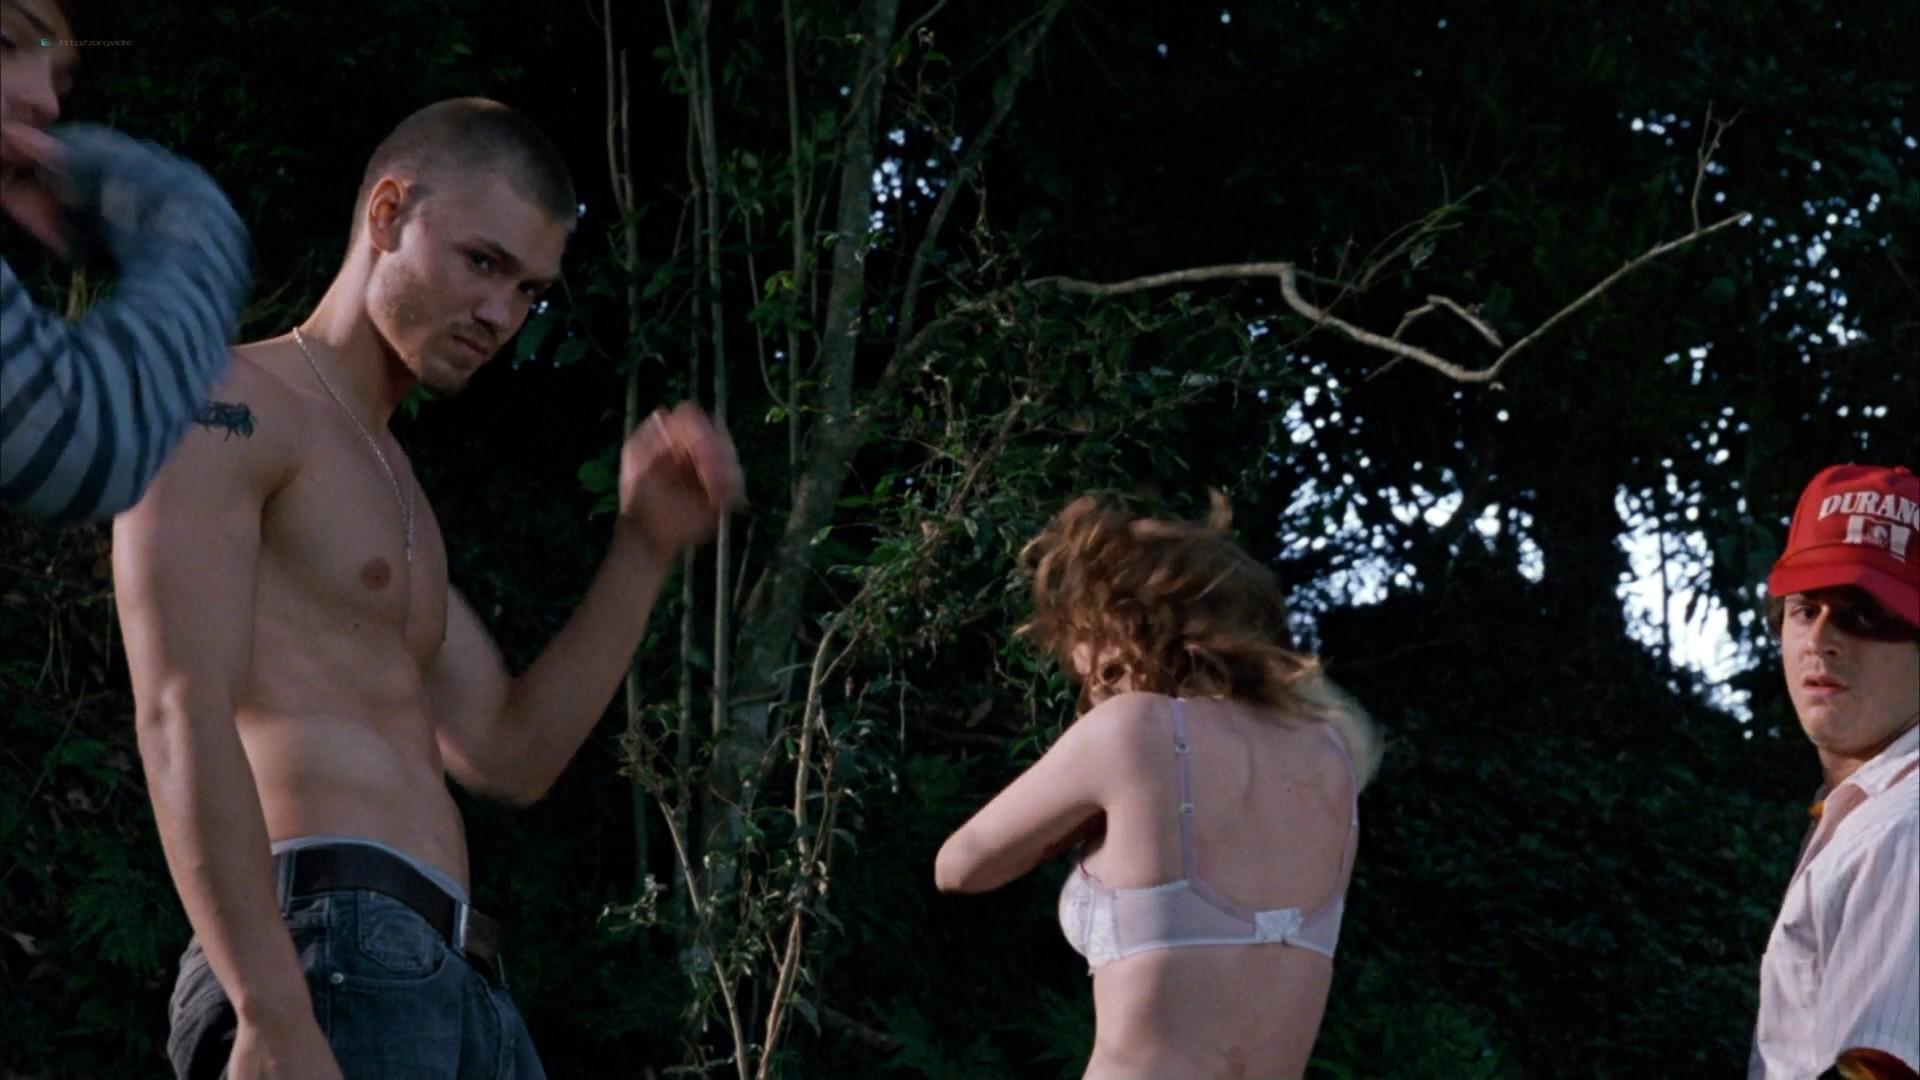 Elisha Cuthbert hot cleavage Paris Hilton striping to bra and panties - House of Wax (2005) HD 1080p (14)